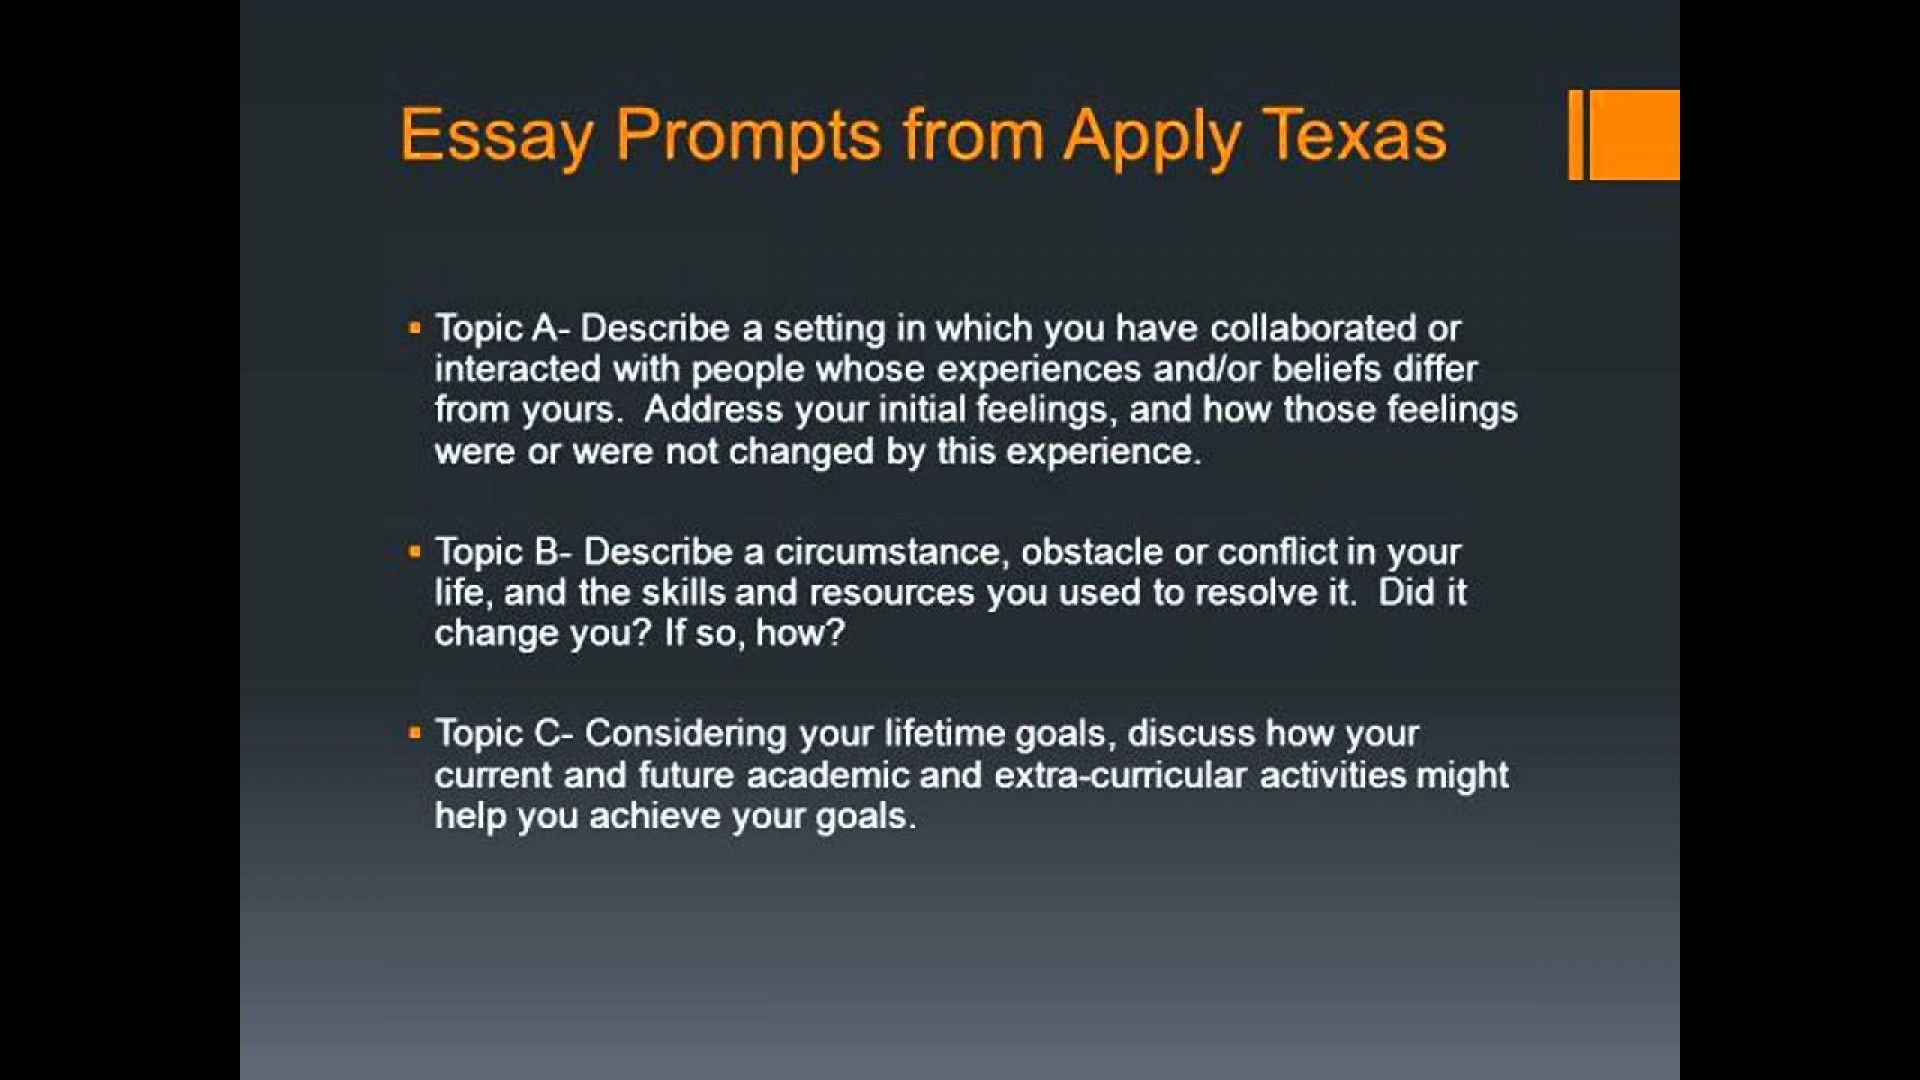 010 Apply Texas Essays Maxresdefault Dreaded Essay B Examples Prompt C Example Prompts 1920